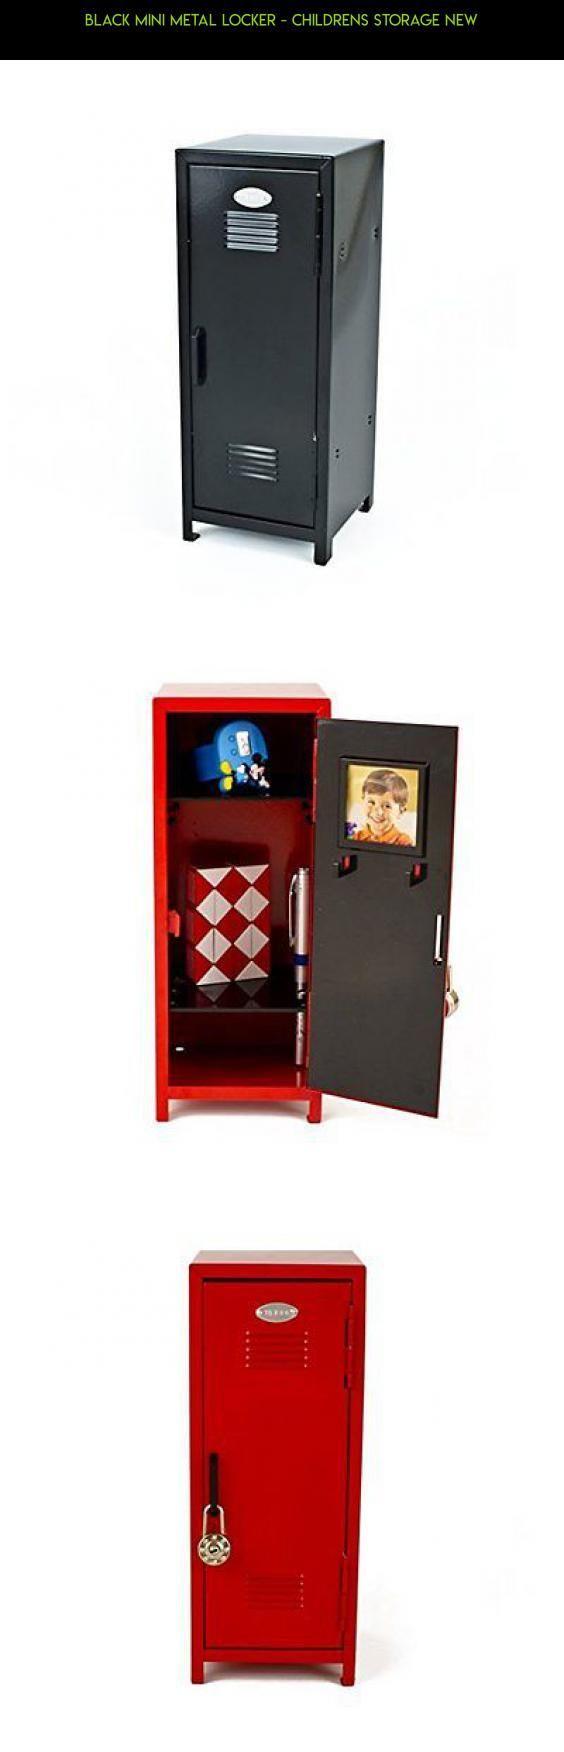 Black Mini Metal Locker - Childrens Storage New #gadgets #locker #fpv #racing #kit #parts #lock #storage #shopping #products #camera #technology #drone #tech #plans